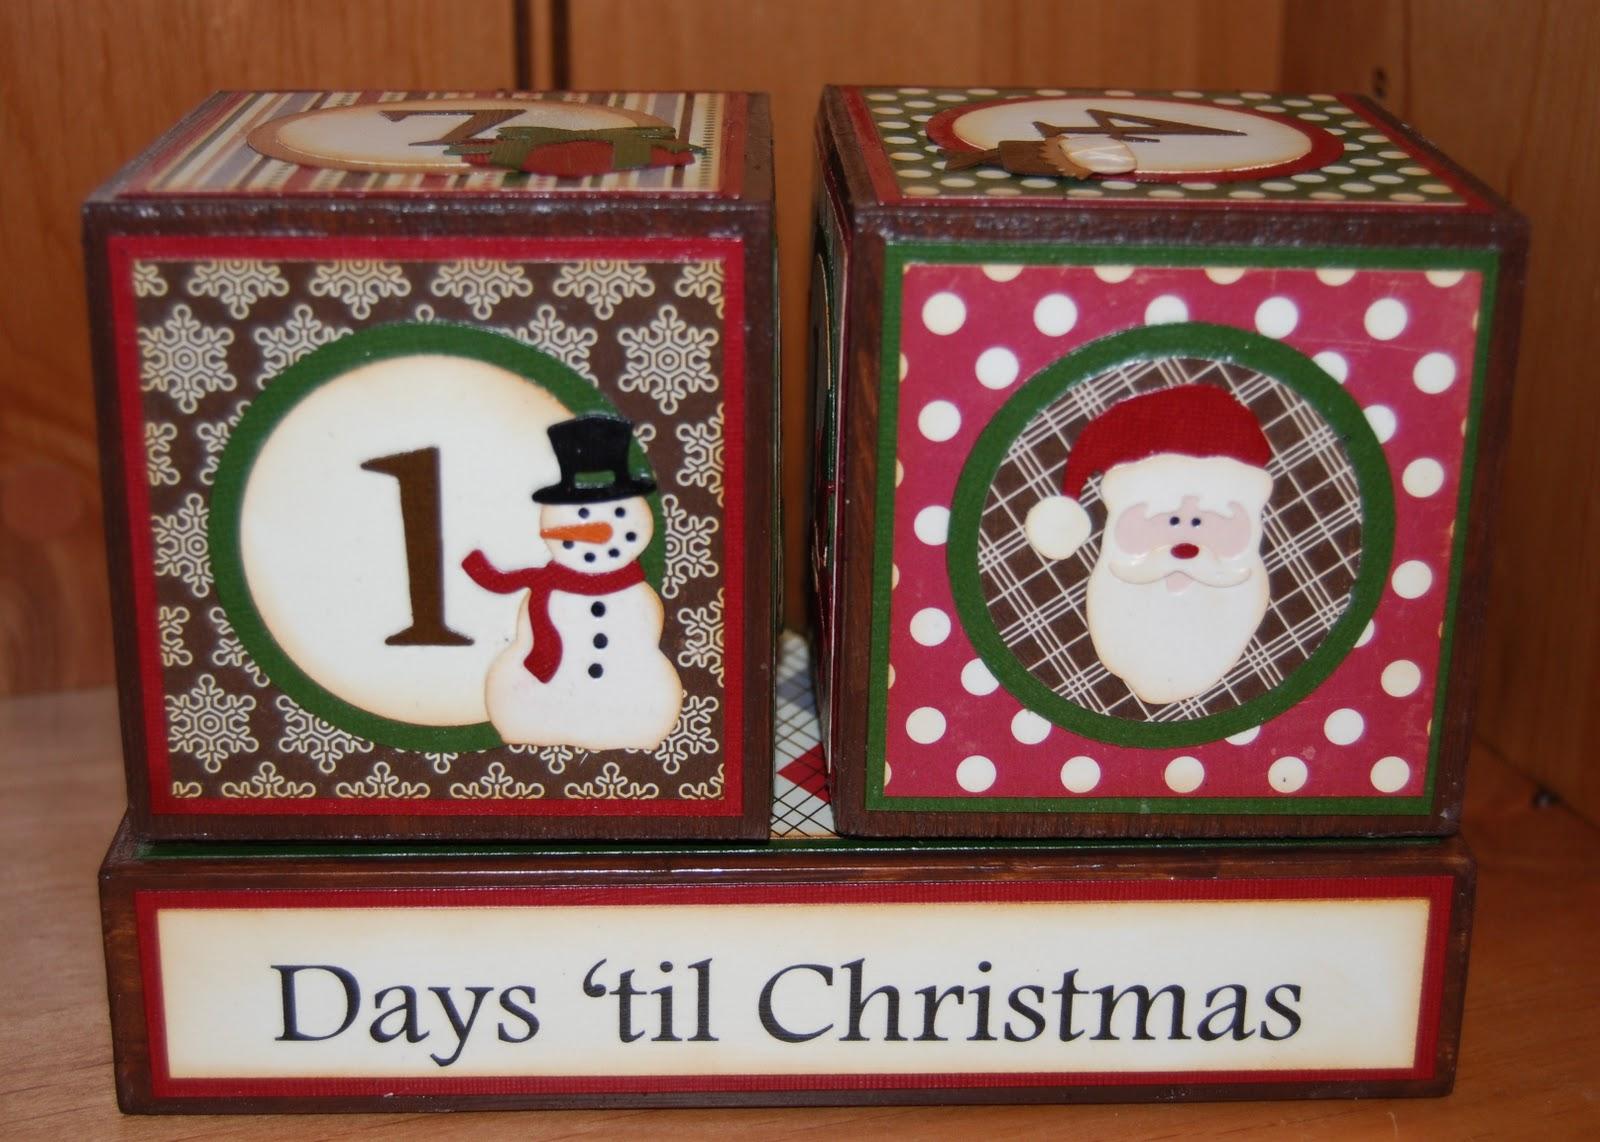 days til christmas - How Many Days Till Christmas 2015